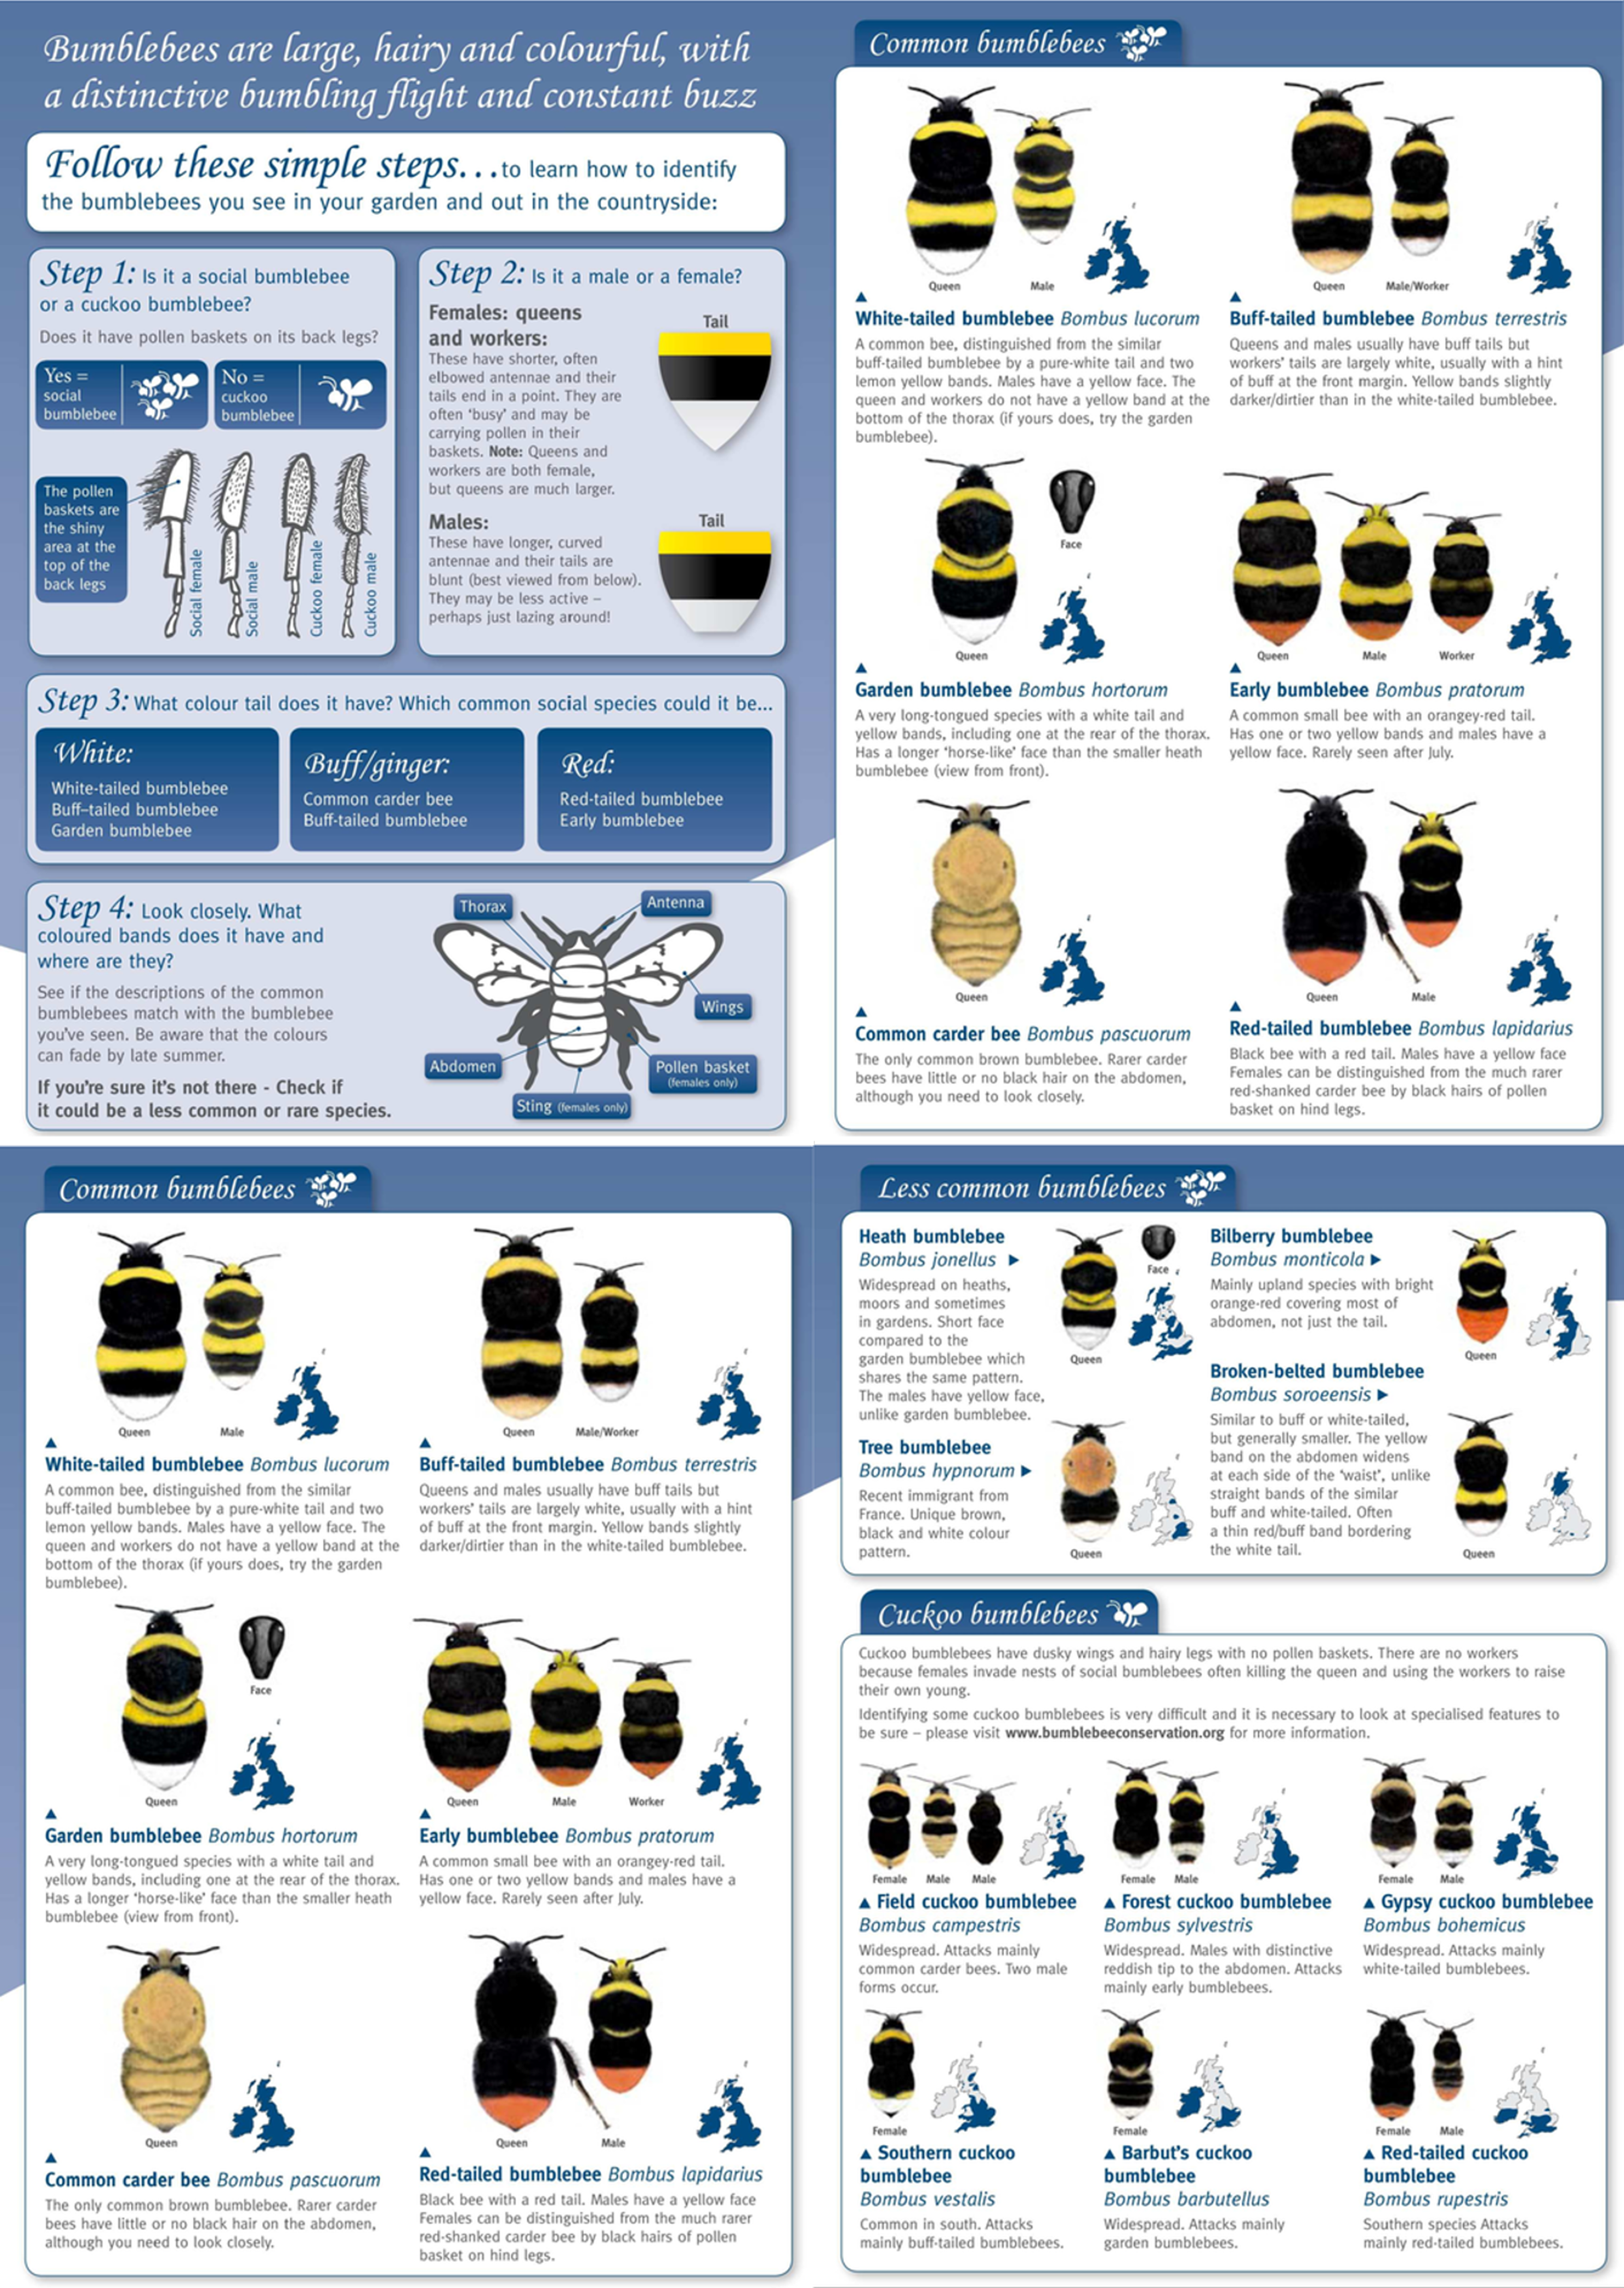 Designing online species identification tools for biological